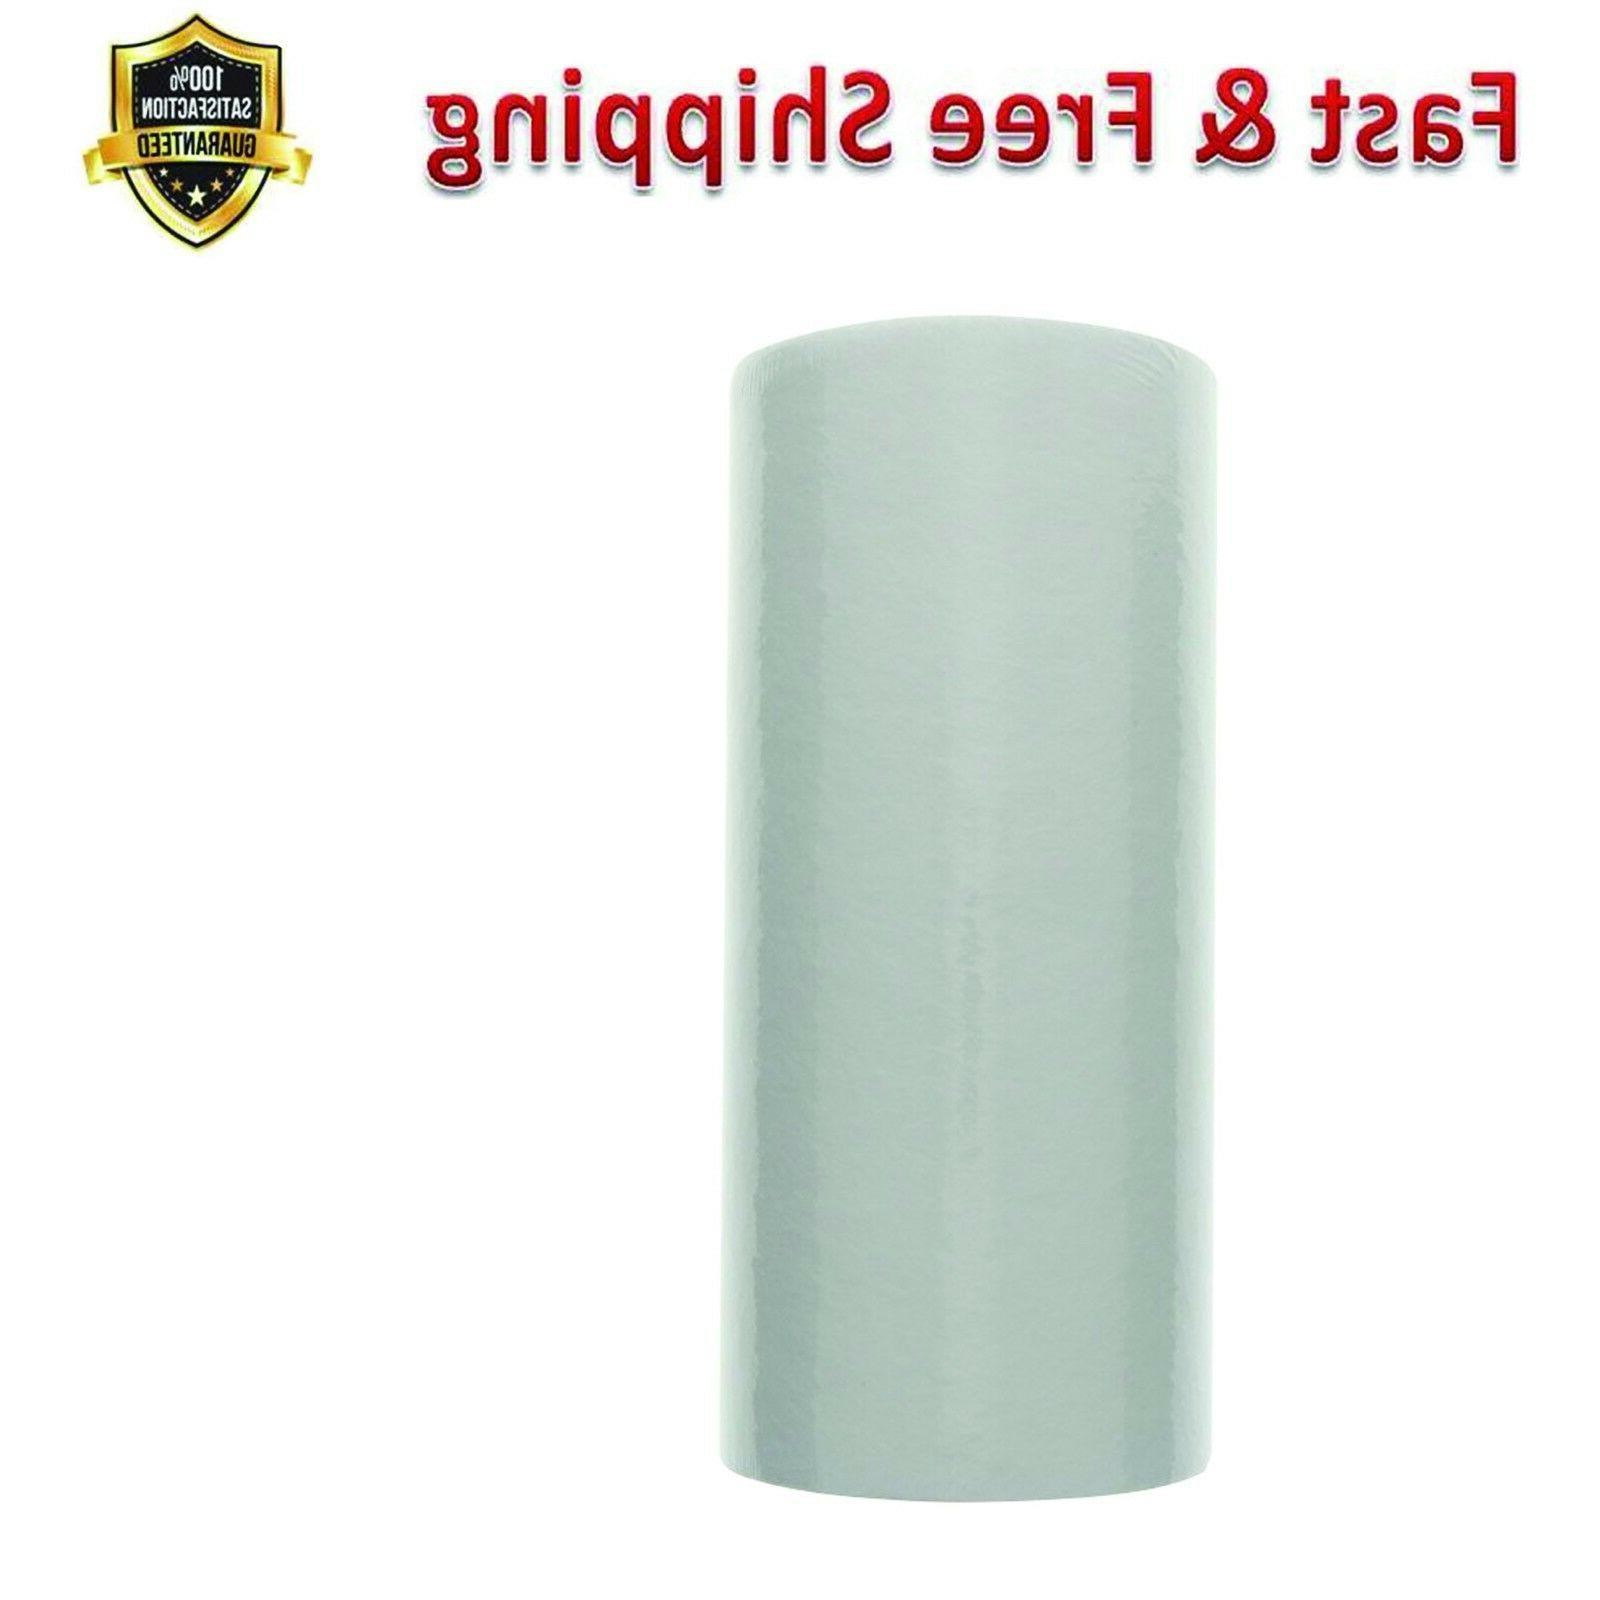 Sediment Filter 5 Micron White Plastic Replacement Under Sin